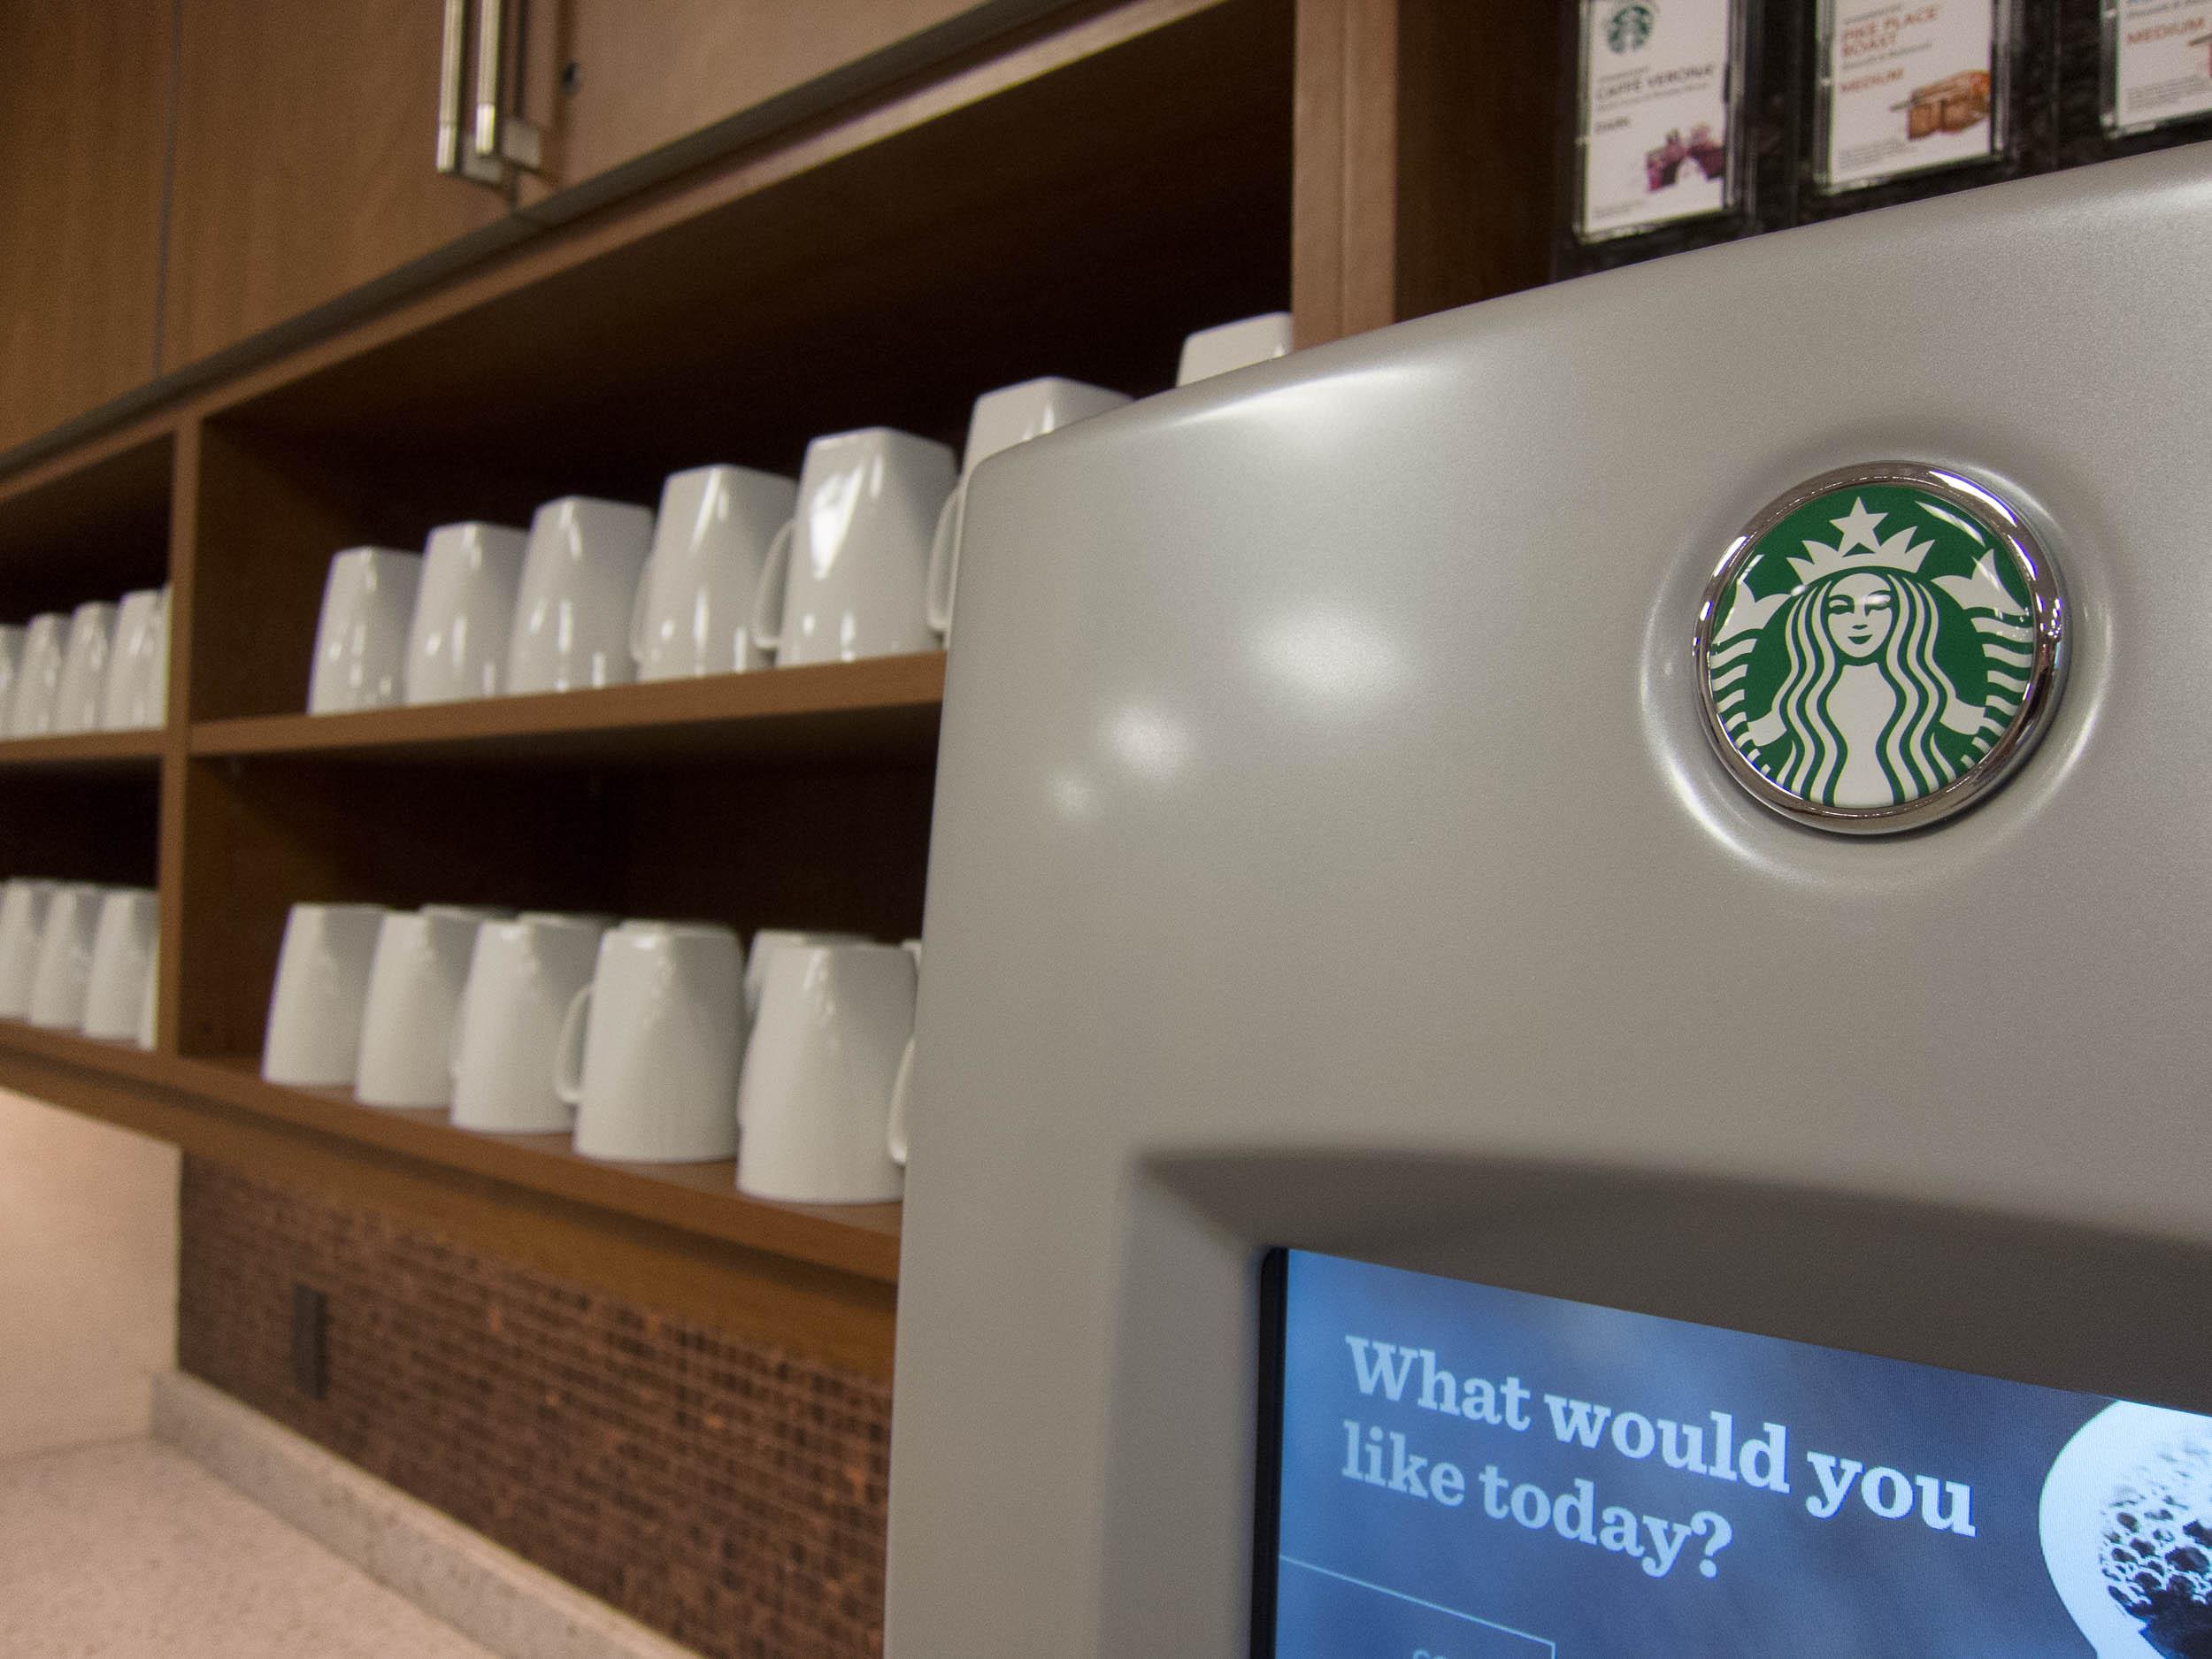 Premium Starbucks Beverage Service